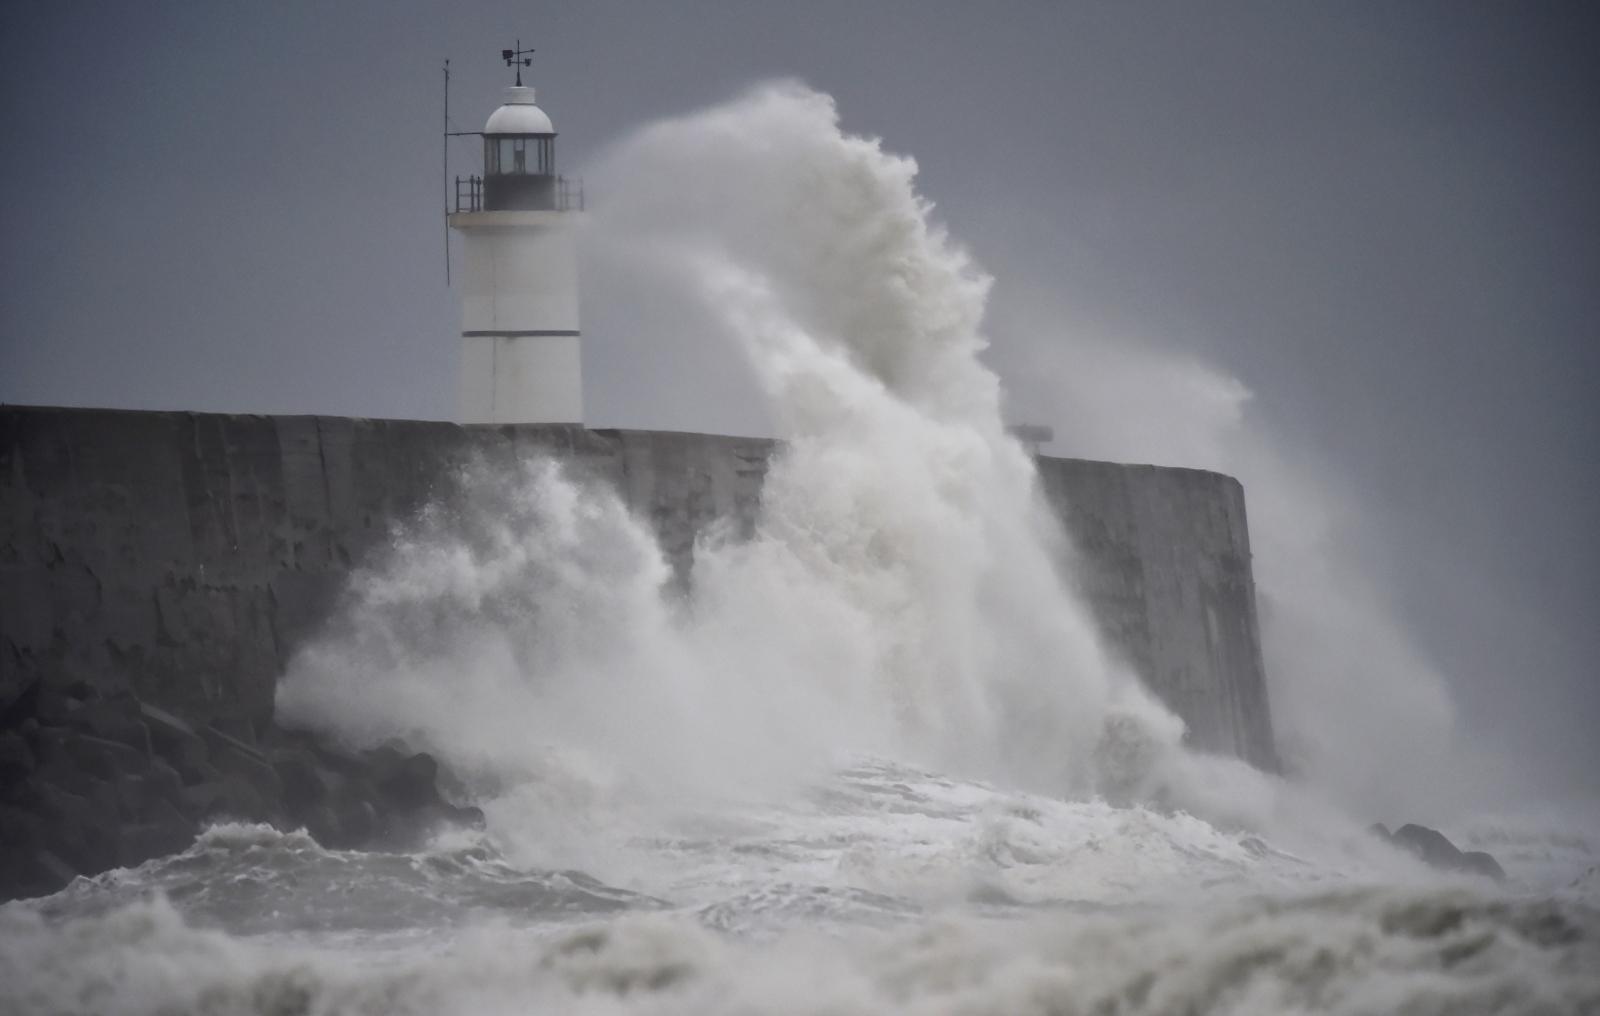 Storm Angus